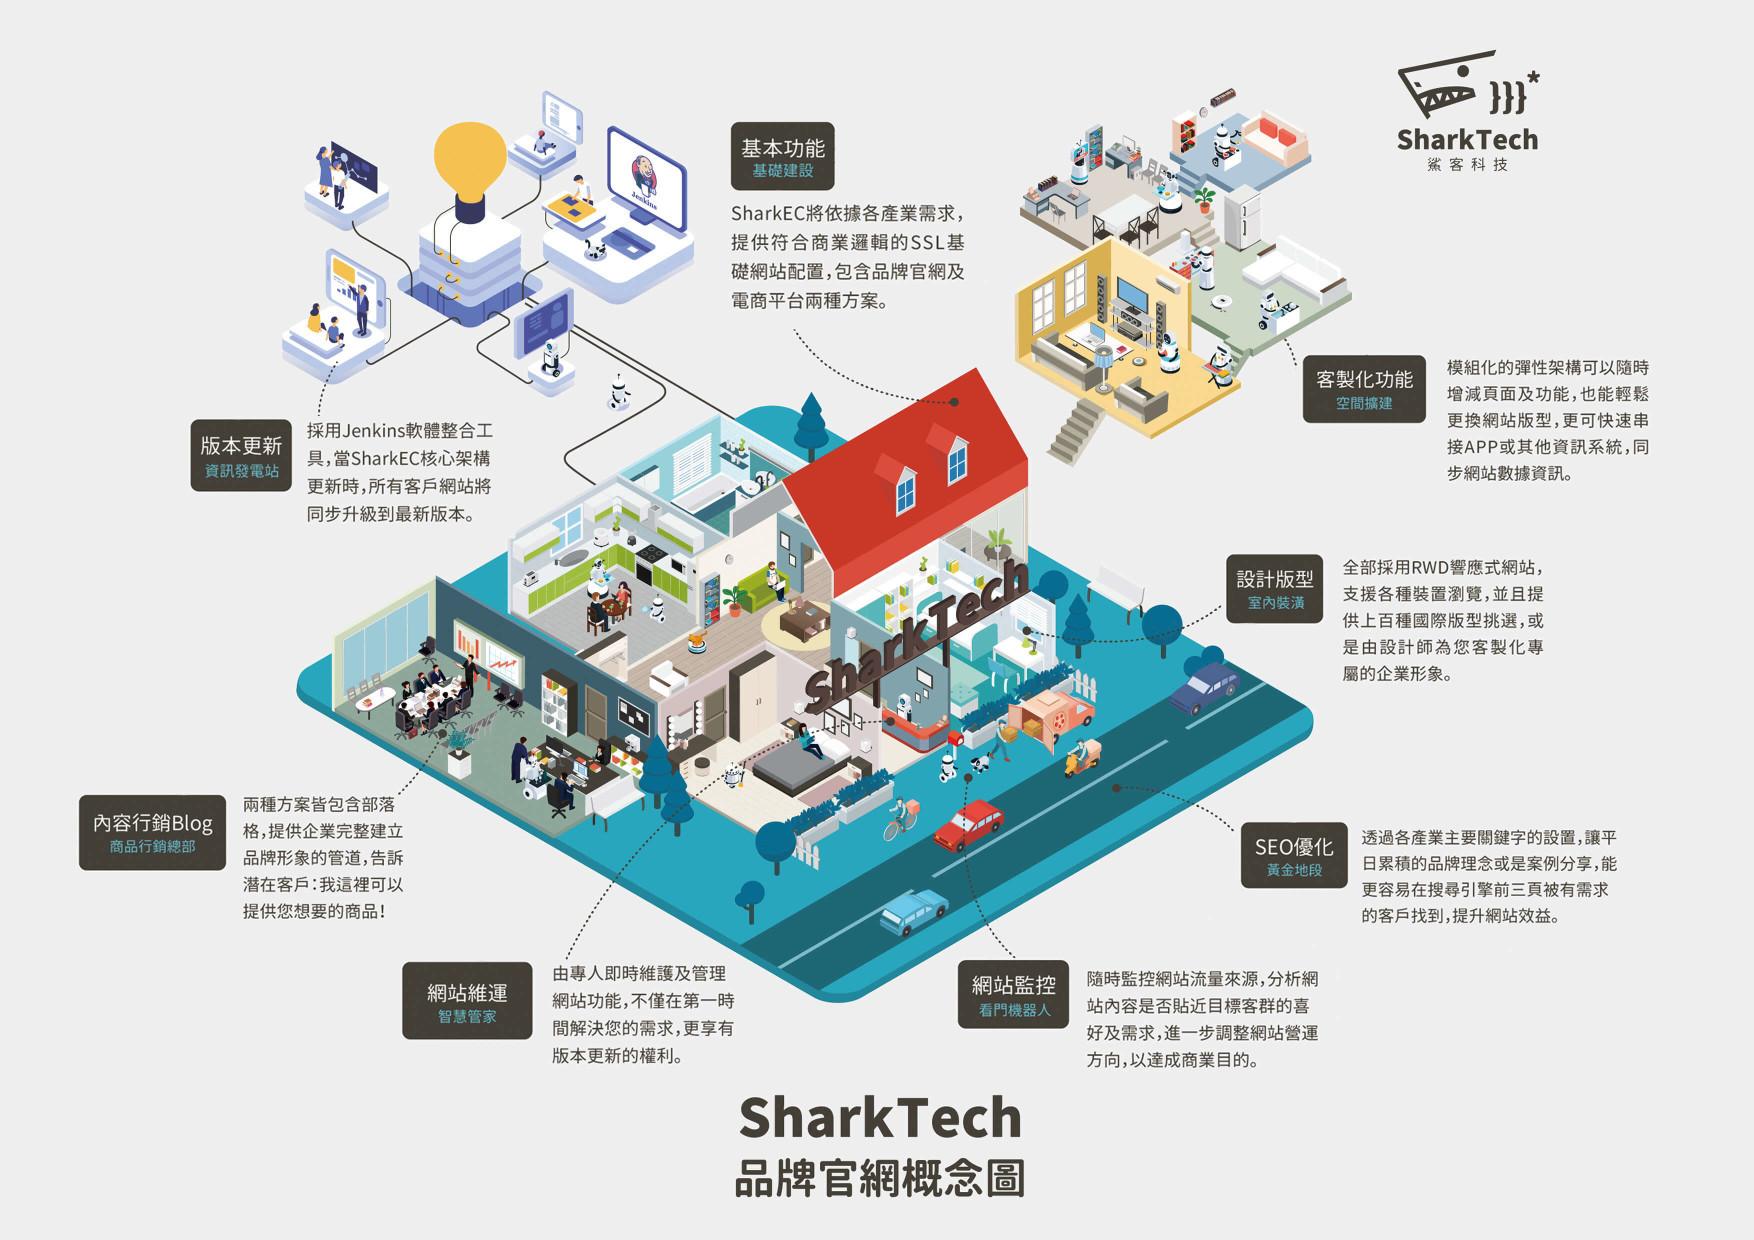 sharkEC網站設計架構圖-鯊客科技SEO優化公司